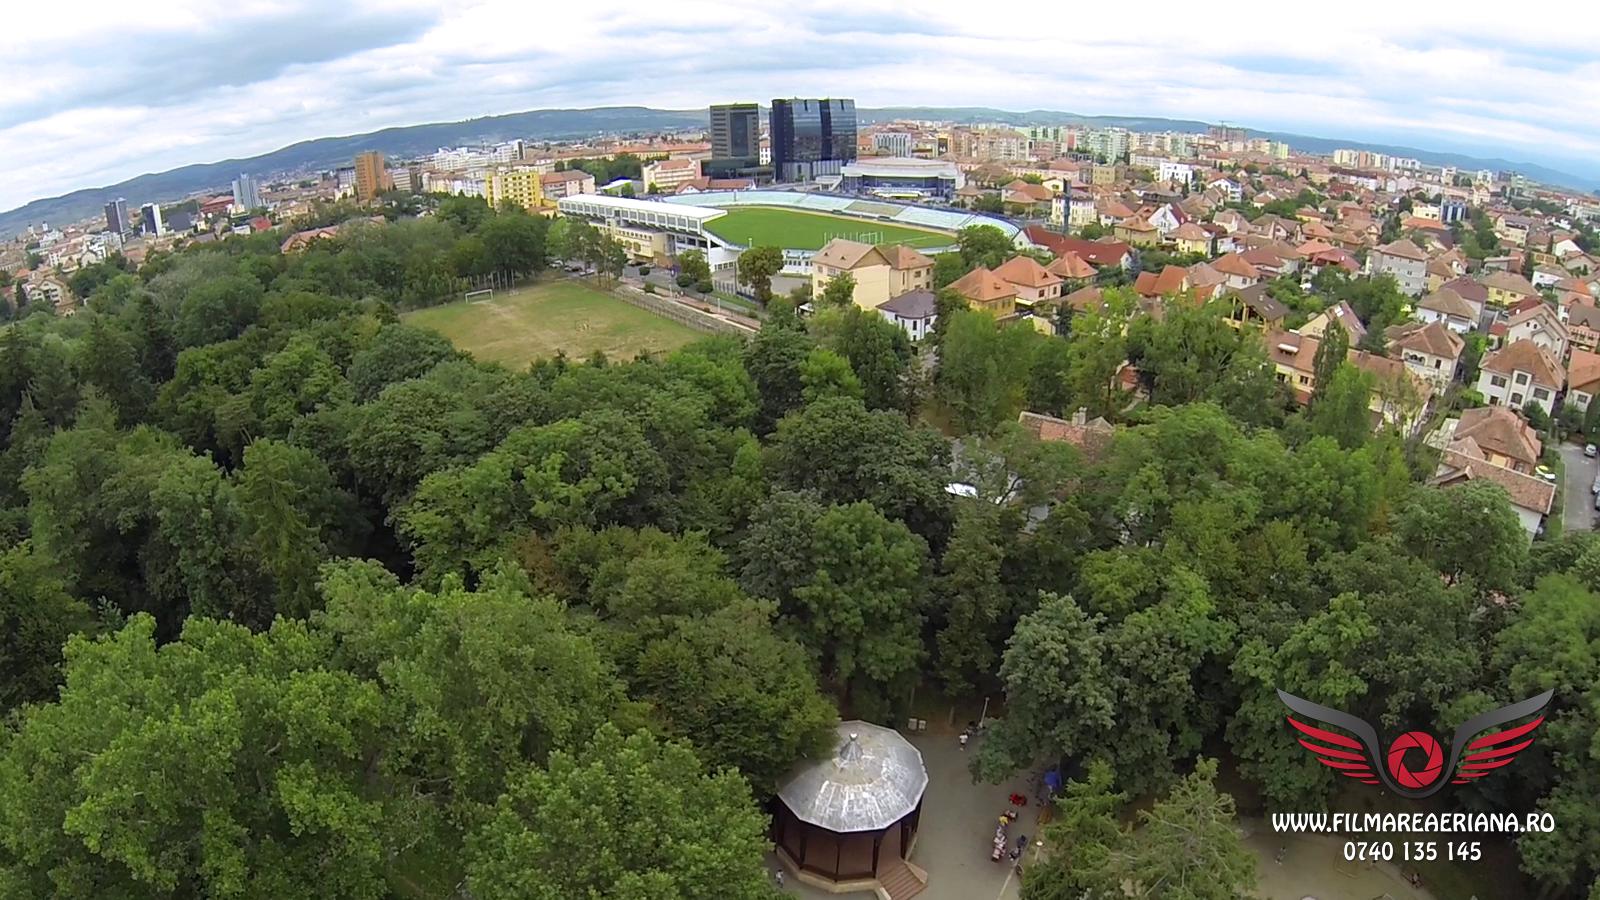 Sibiu Aerial Image – fotografii aeriene